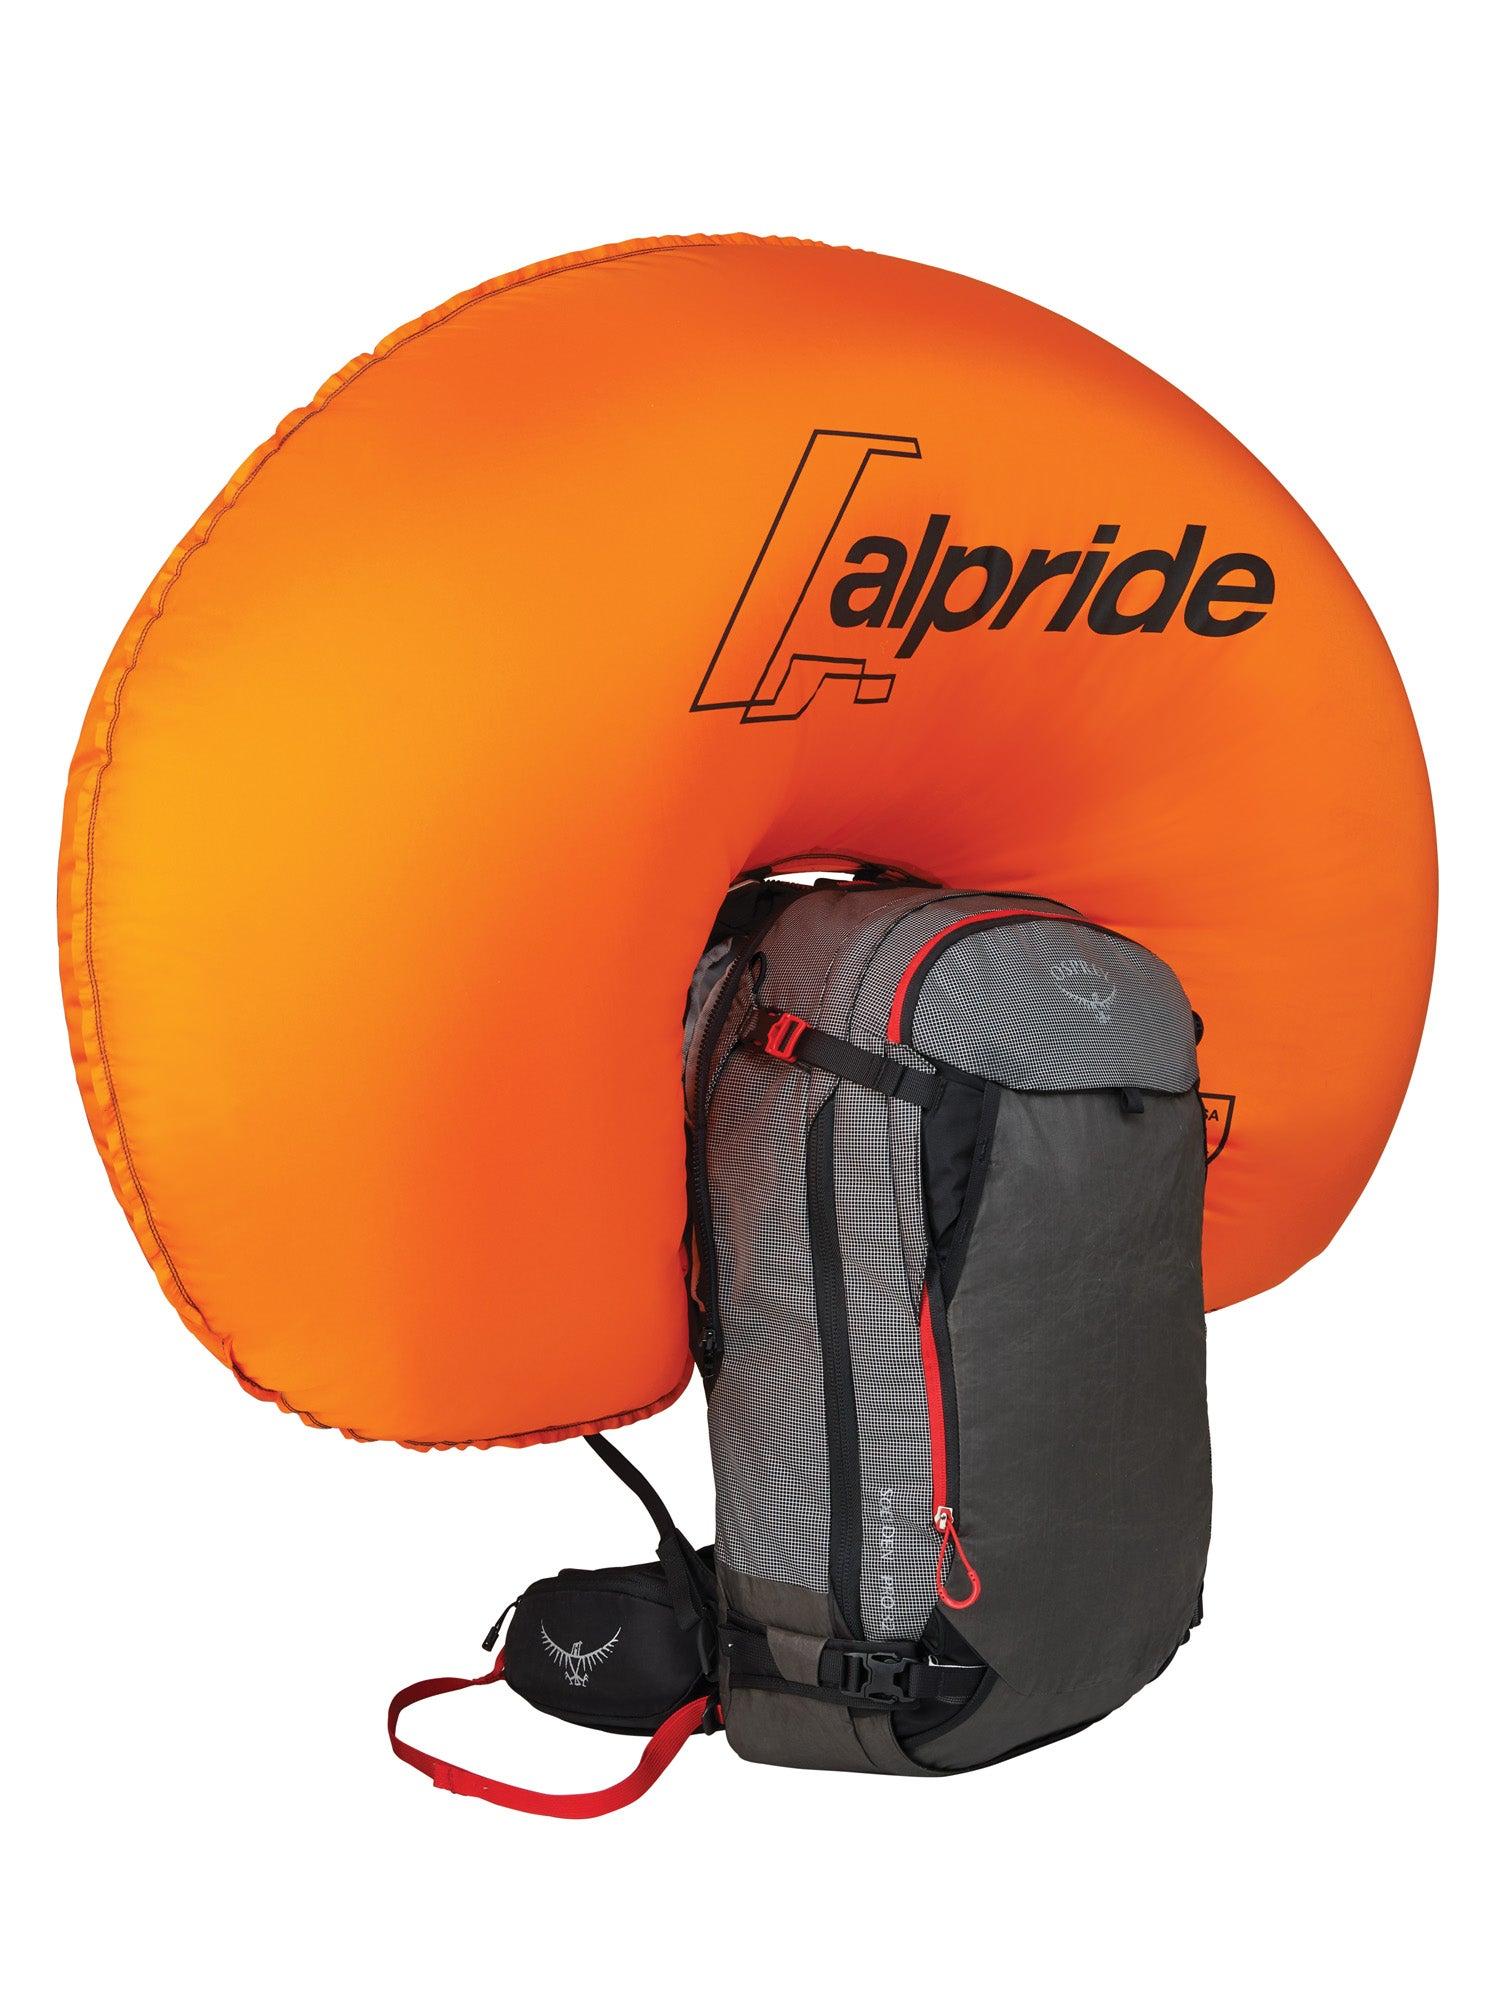 Osprey Soelden Pro Avalanche Ski Backpack